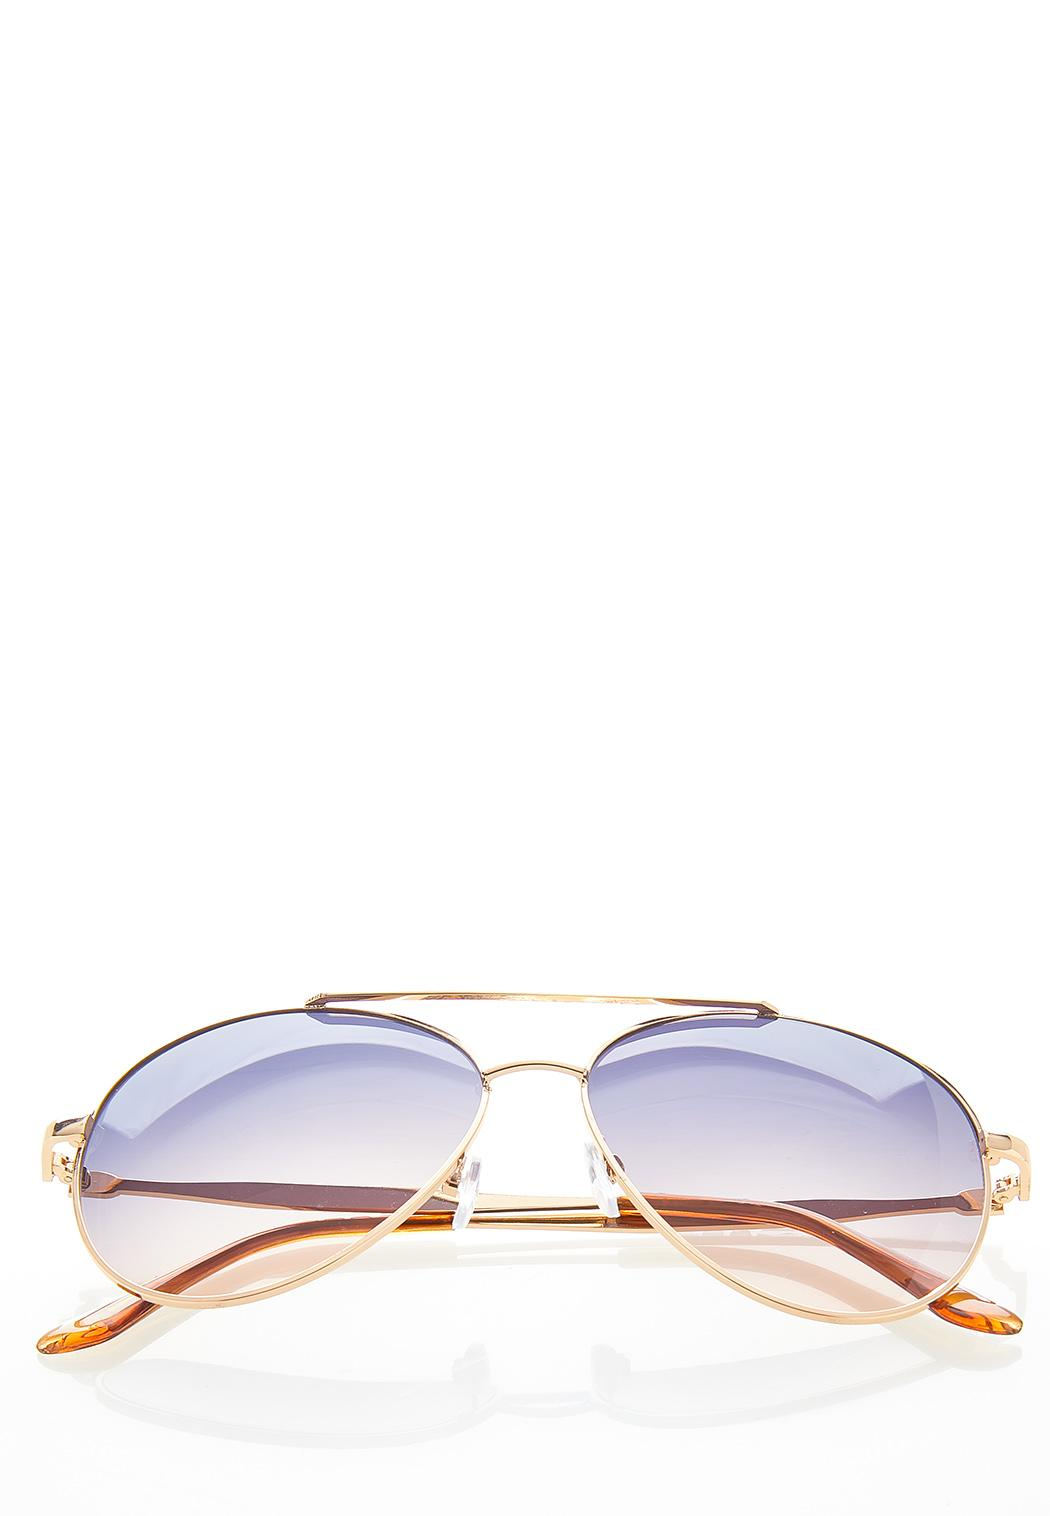 Bling Arm Aviator Sunglasses